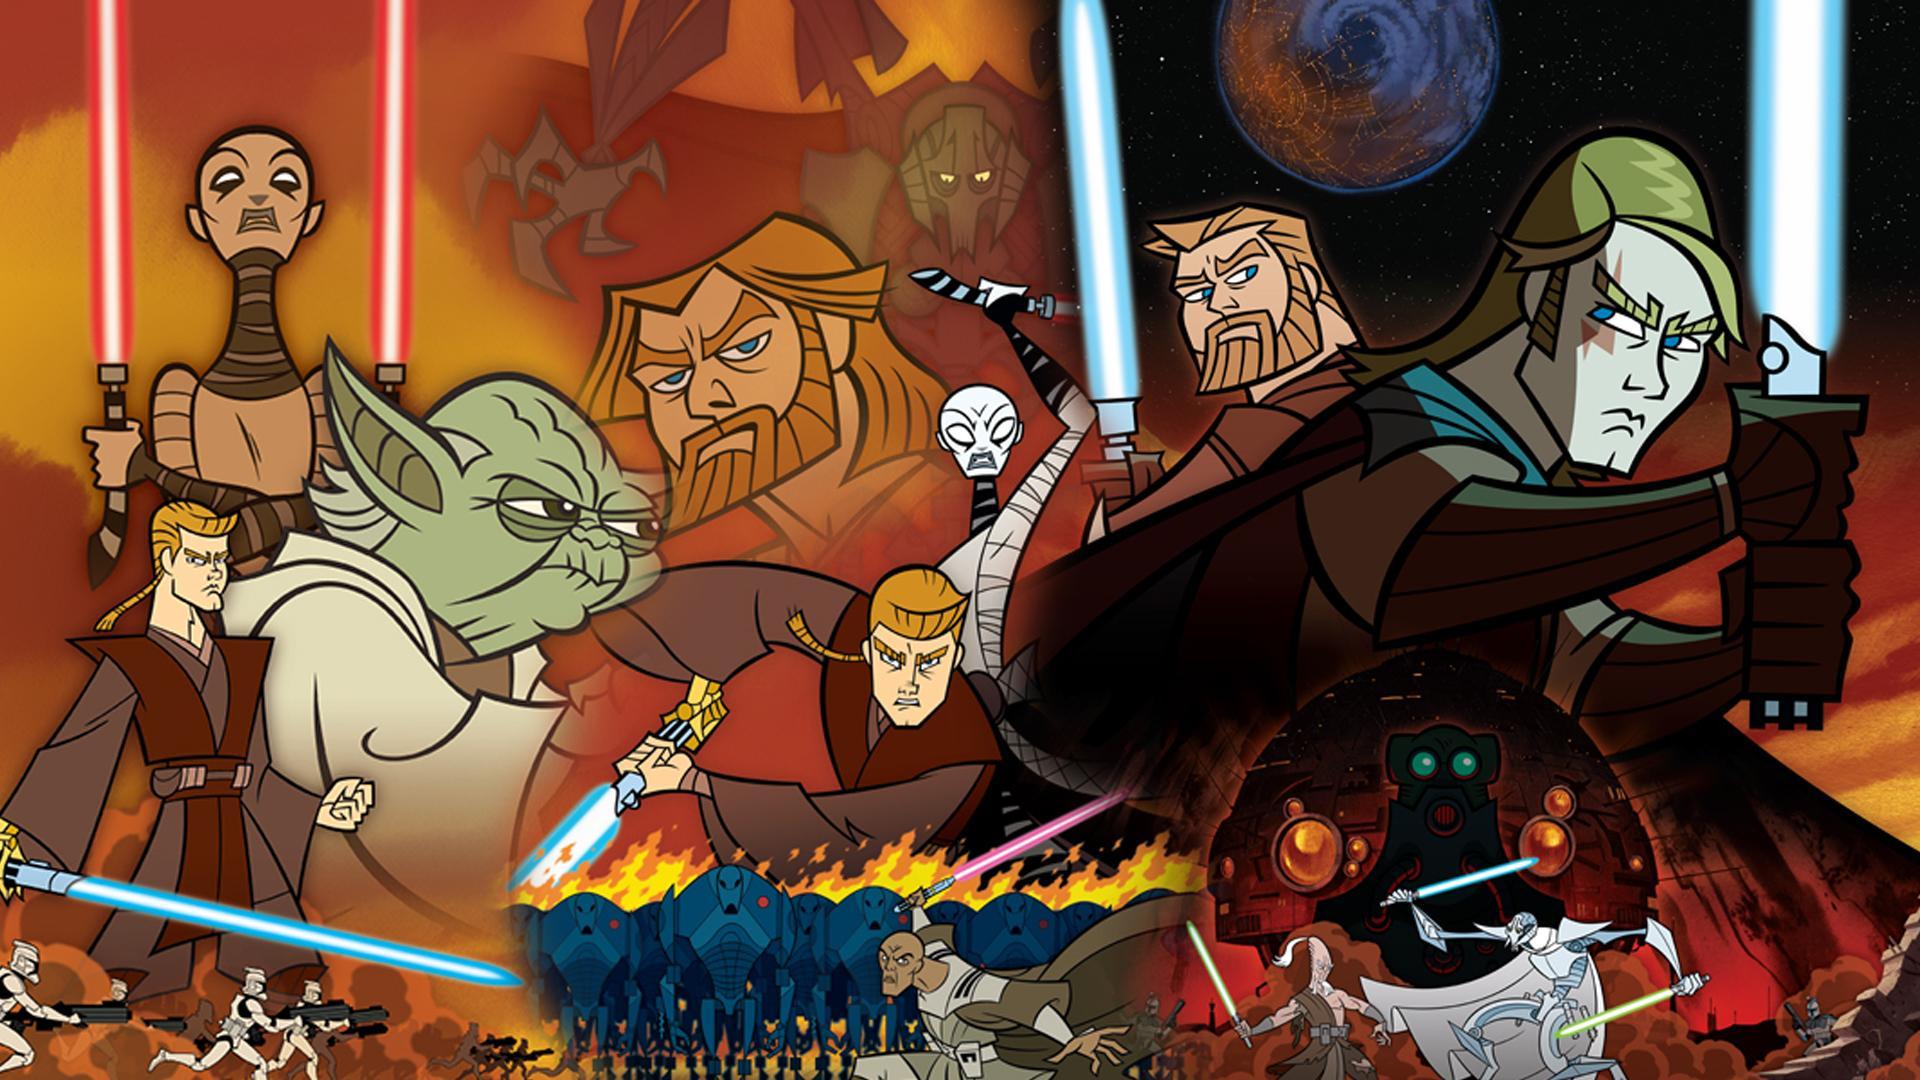 Star Wars Clone Wars 2003 Cover 1920x1080 Download Hd Wallpaper Wallpapertip